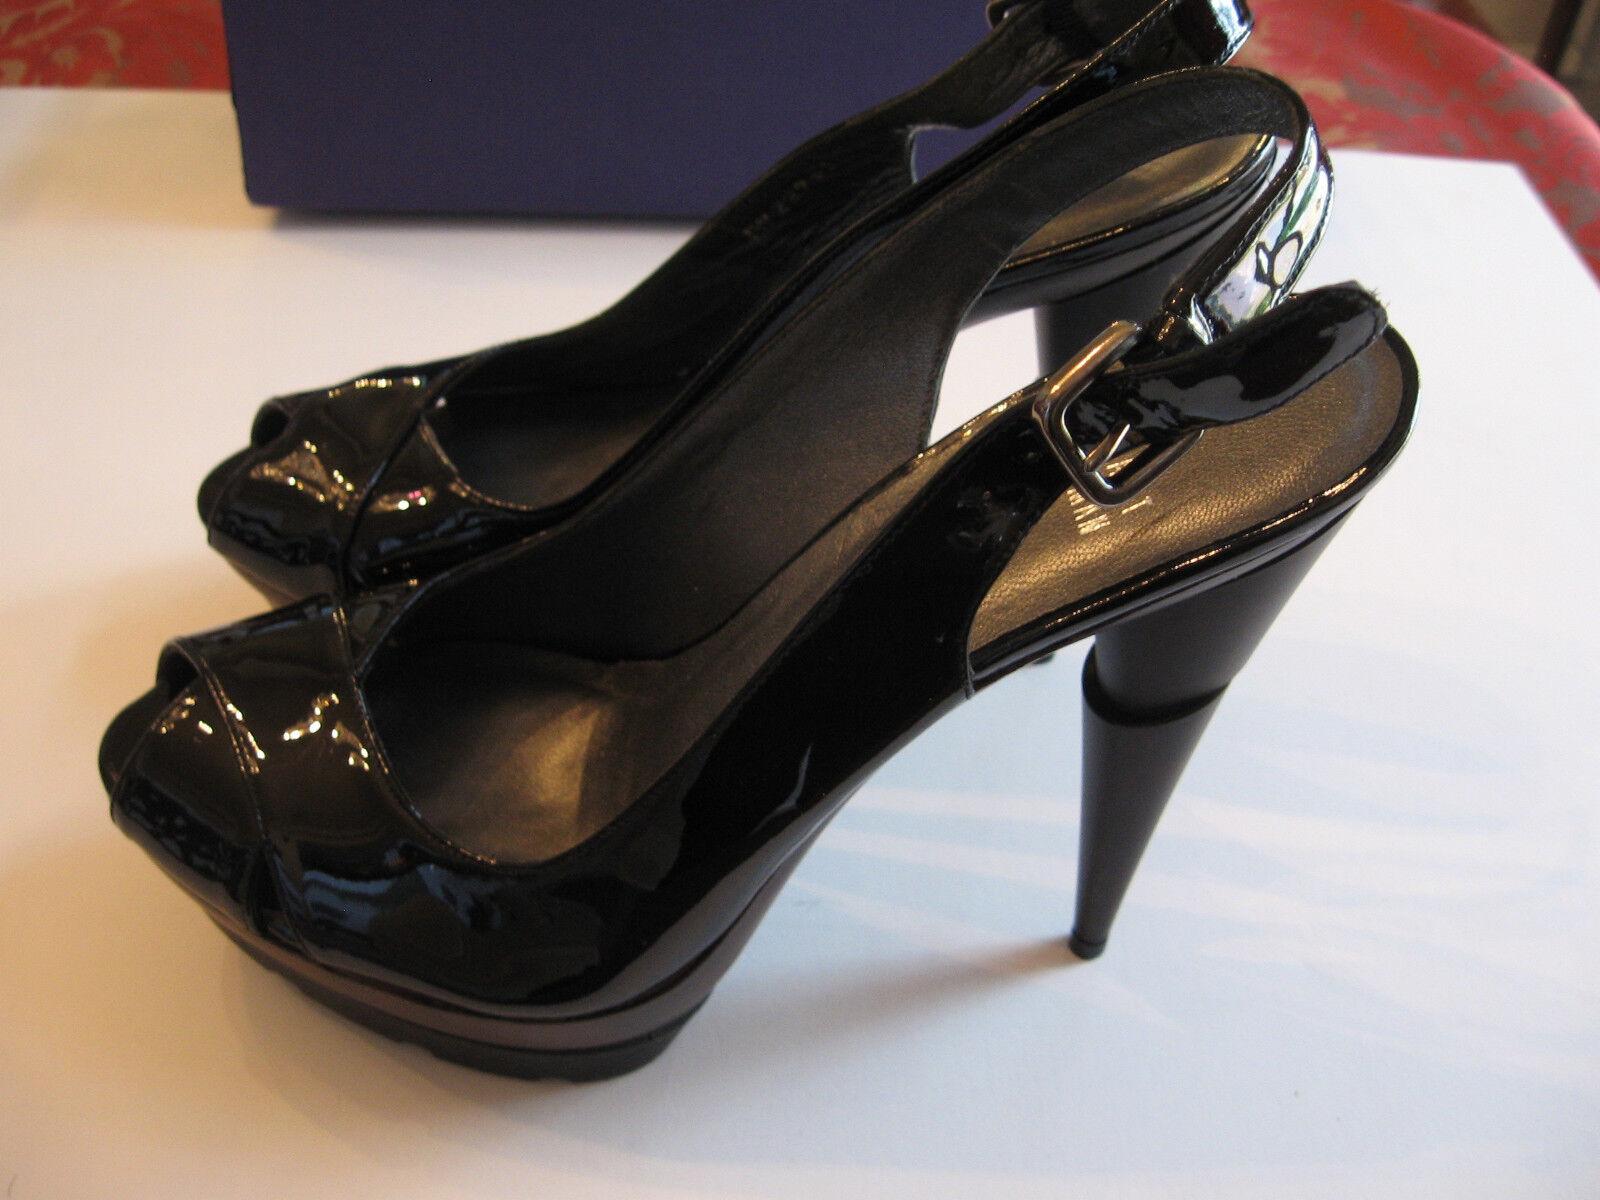 NEW STUART WEITZMAN noir PATENT LEATHER STILETTO LADIES chaussures  Taille 8 M